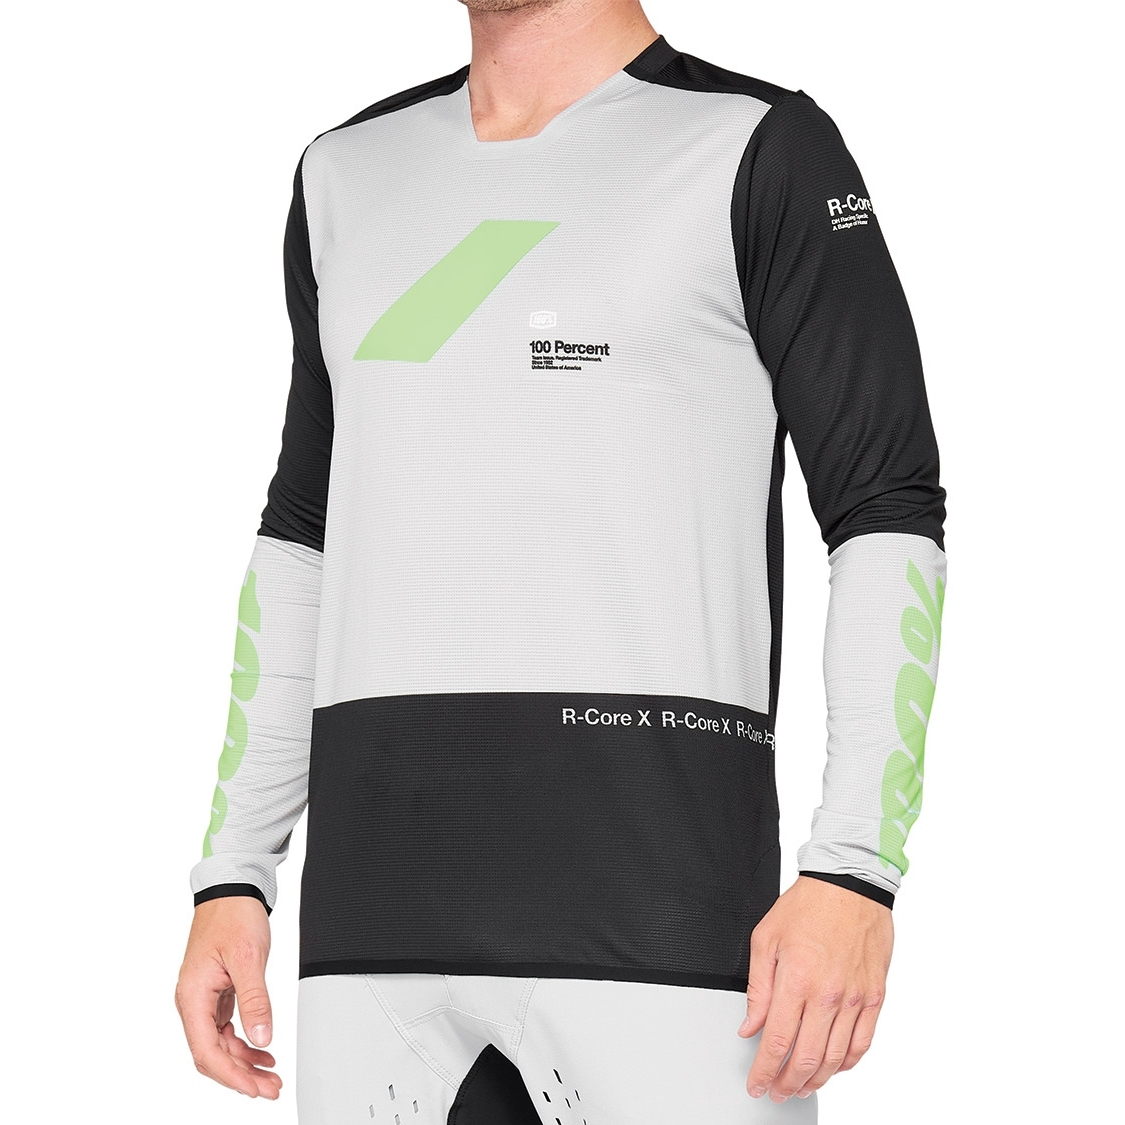 100% R-Core X Jersey - vapor/black